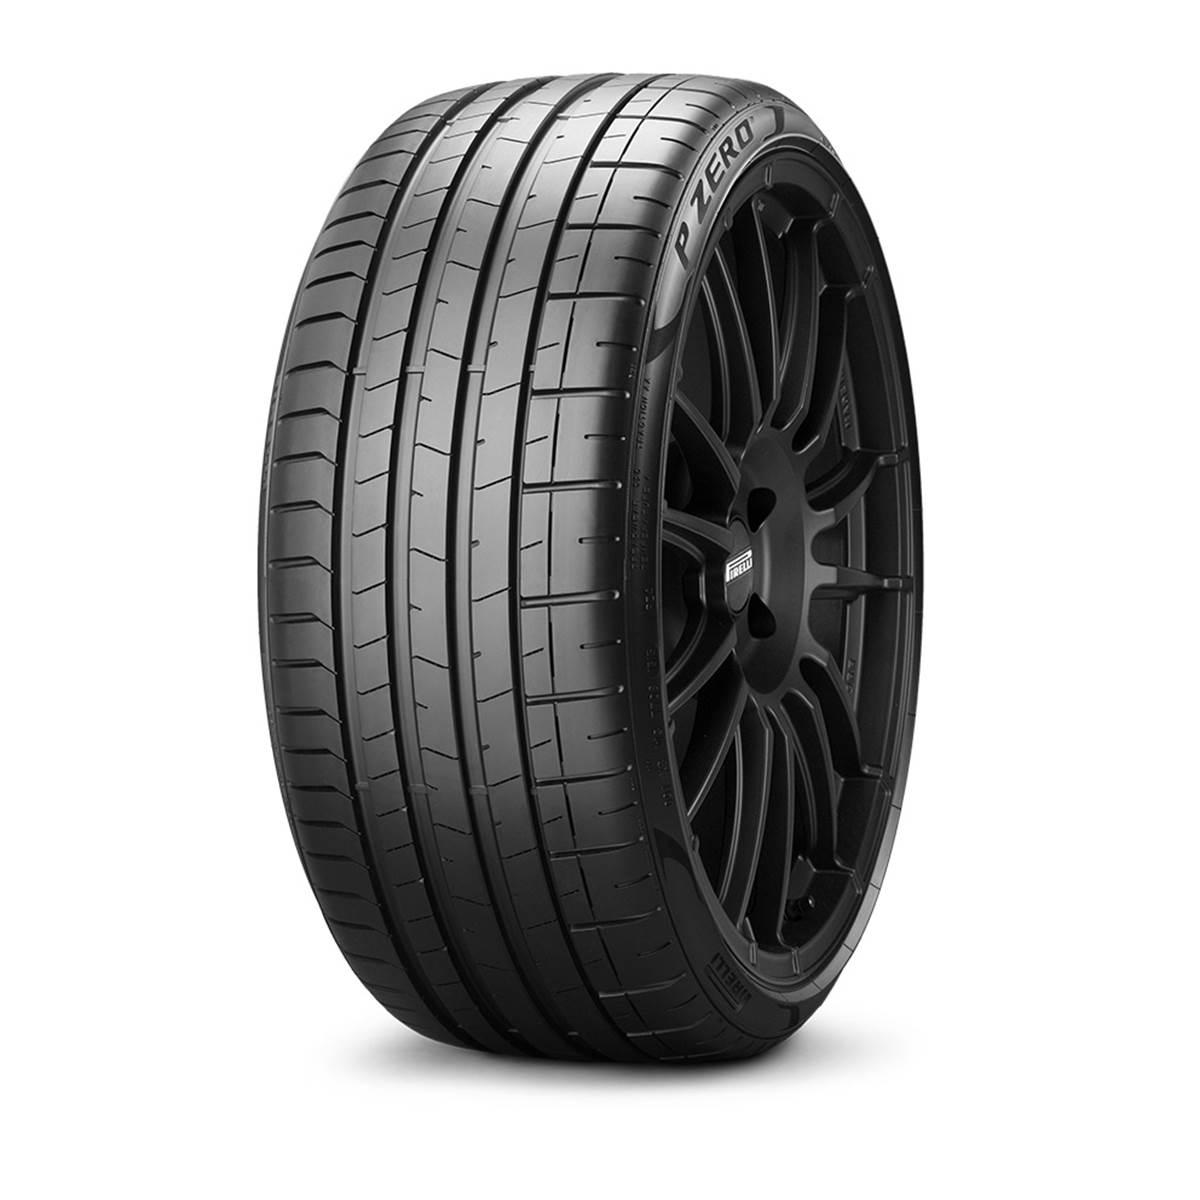 Pneu Pirelli 245/45R18 100W P-Zero homologué Jaguar XL